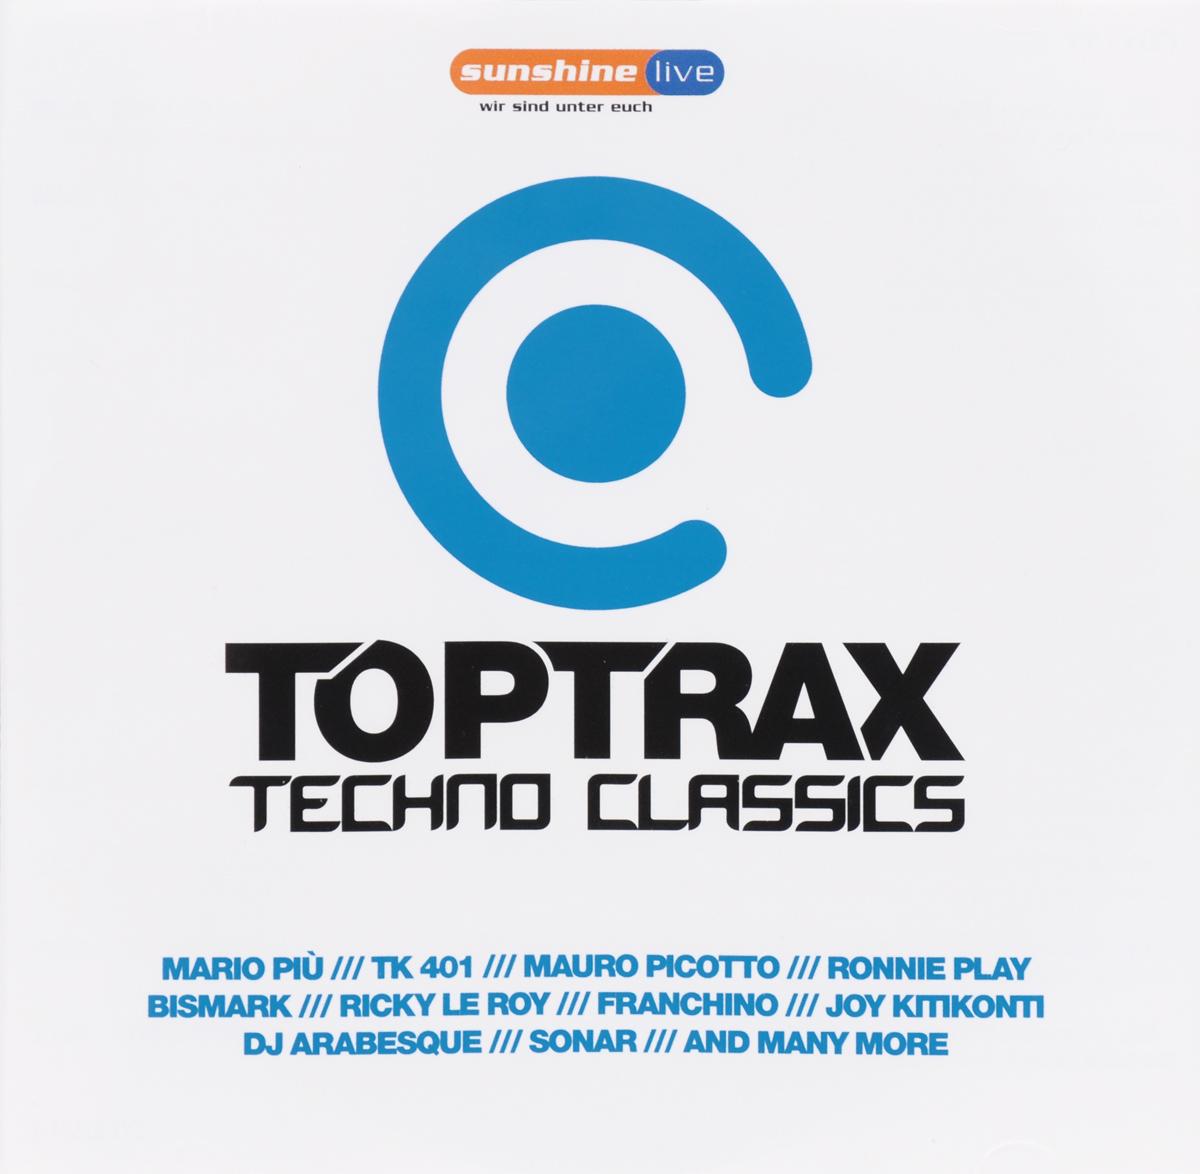 Toptrax Techno Classics (2 CD)